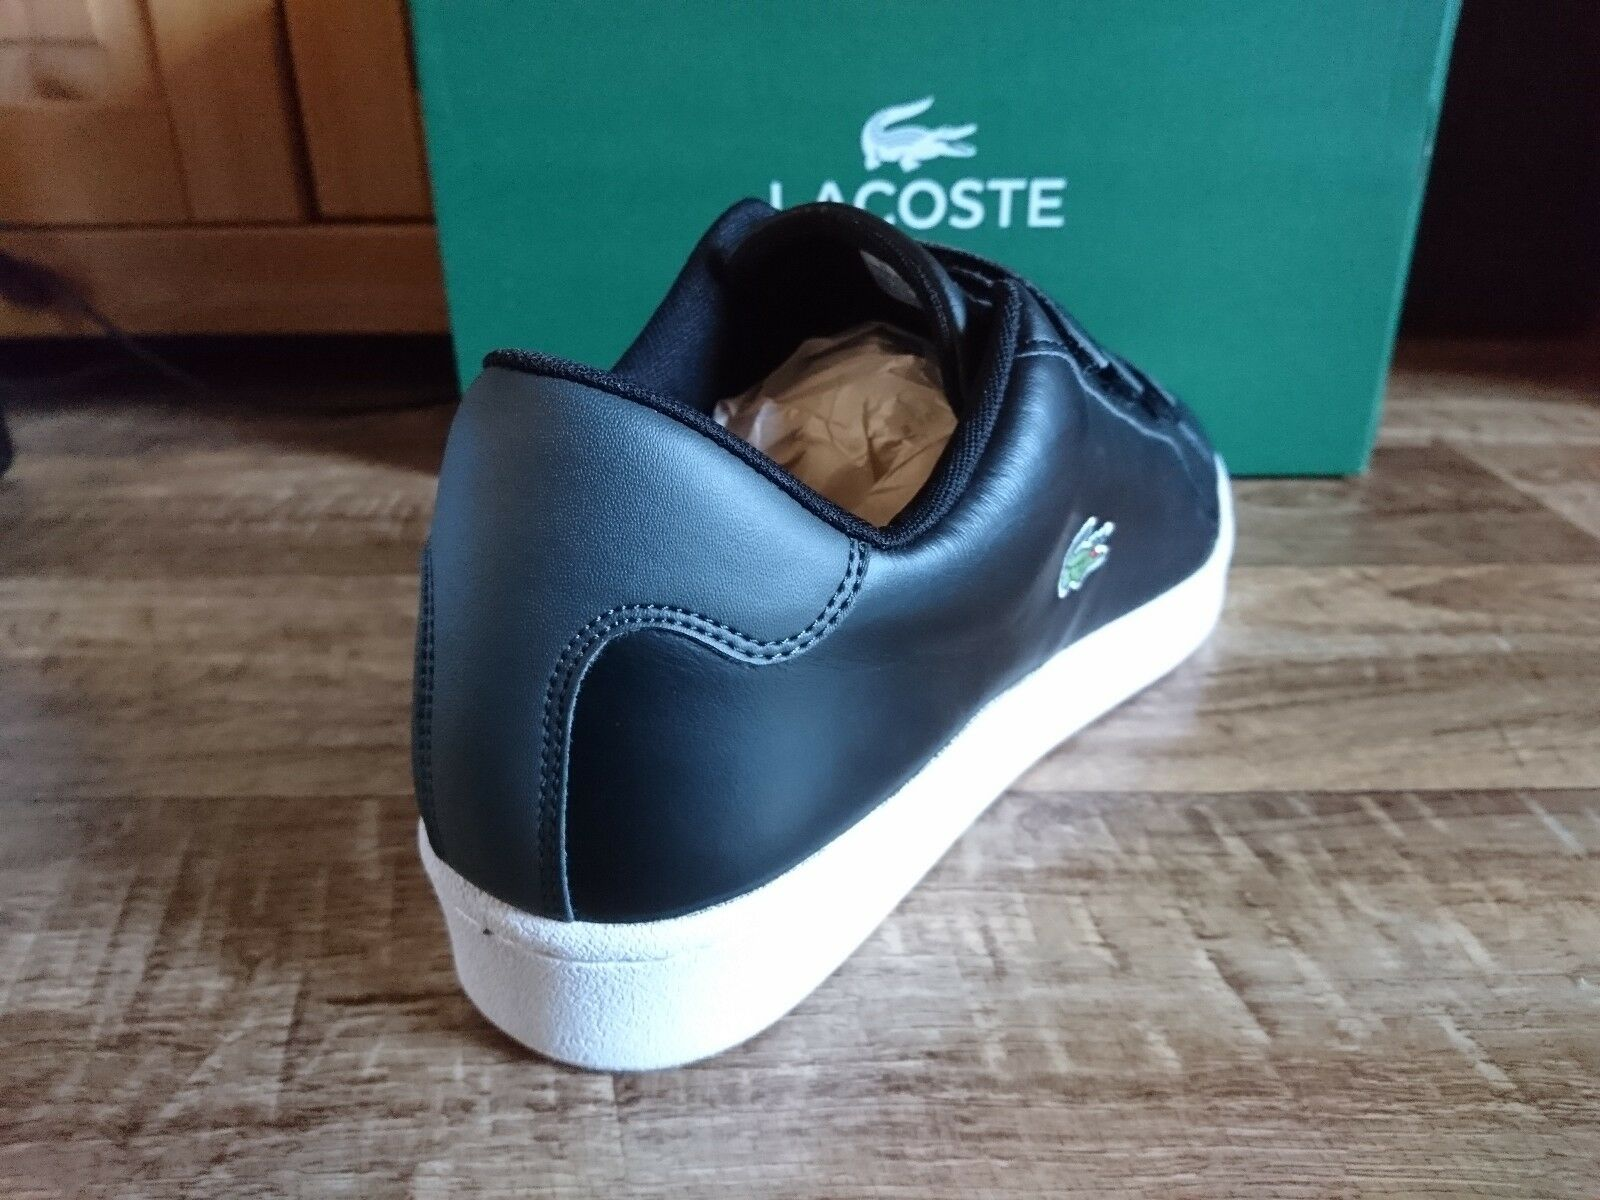 Lacoste 1 Camden New Cup S216 1 Lacoste  Herren Schuhe Sneaker Leder Schwarz NEU ad5bd3